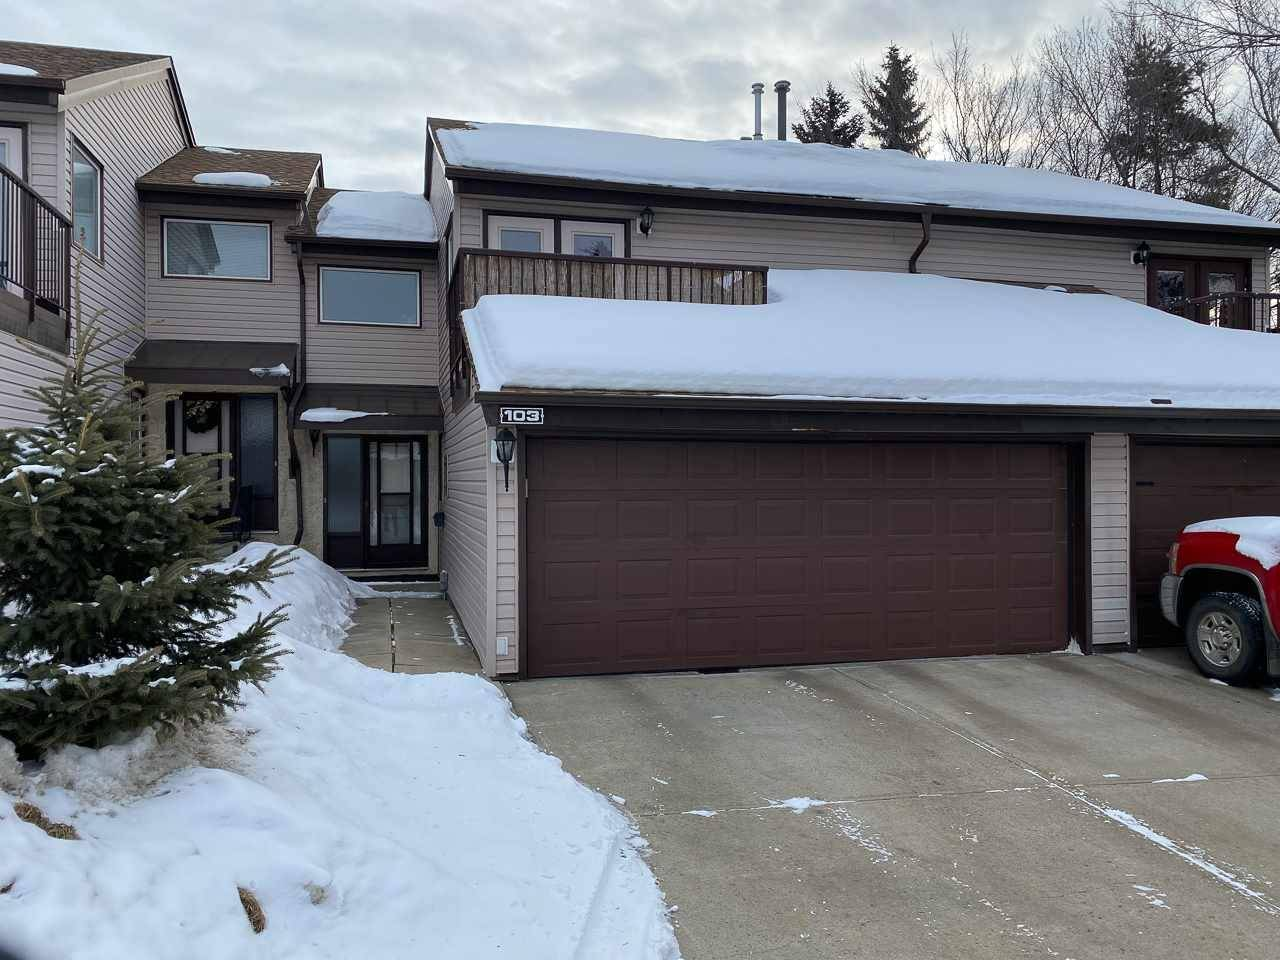 Townhouse for sale at 103 Grandin Wo  St. Albert Alberta - MLS: E4191223